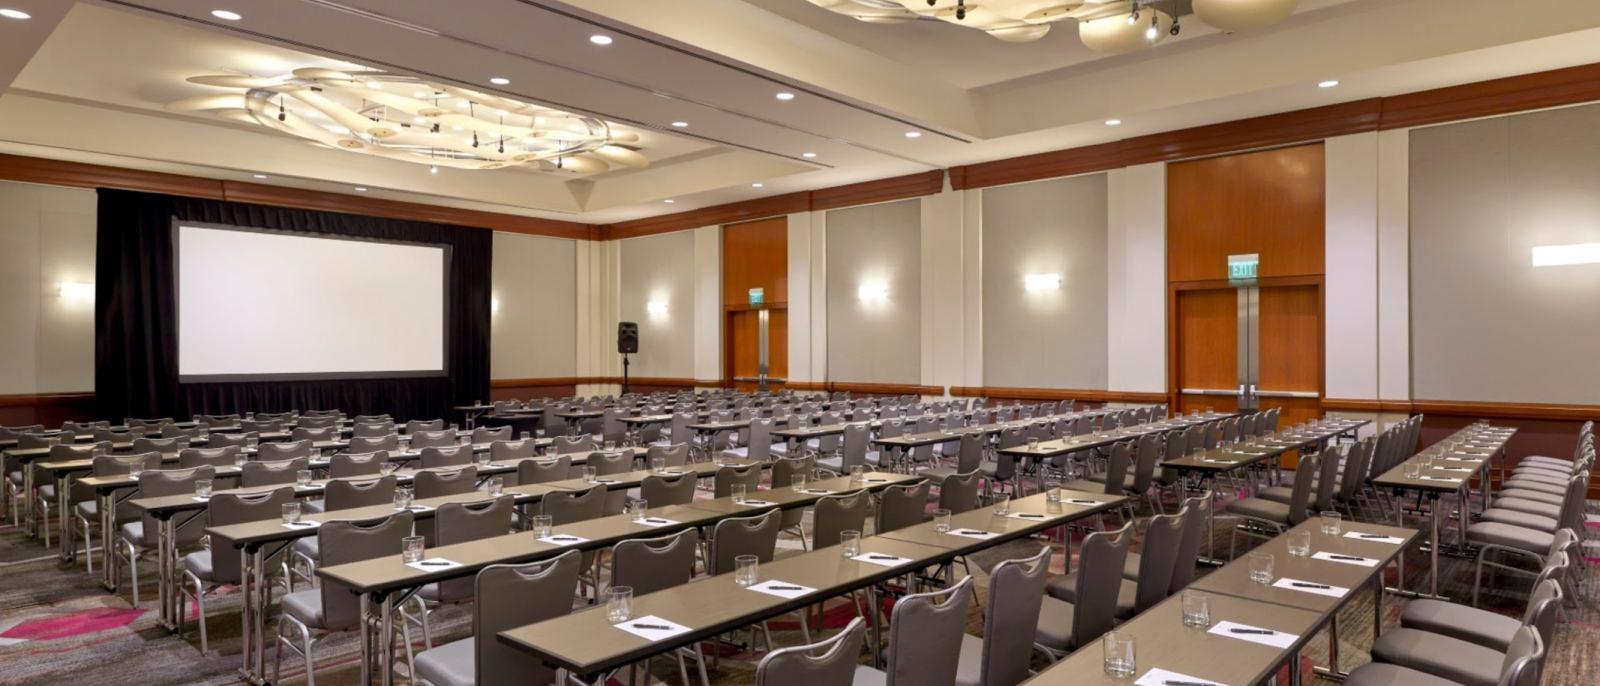 LATCB-Photo-5--Ballroom-1920x1440-